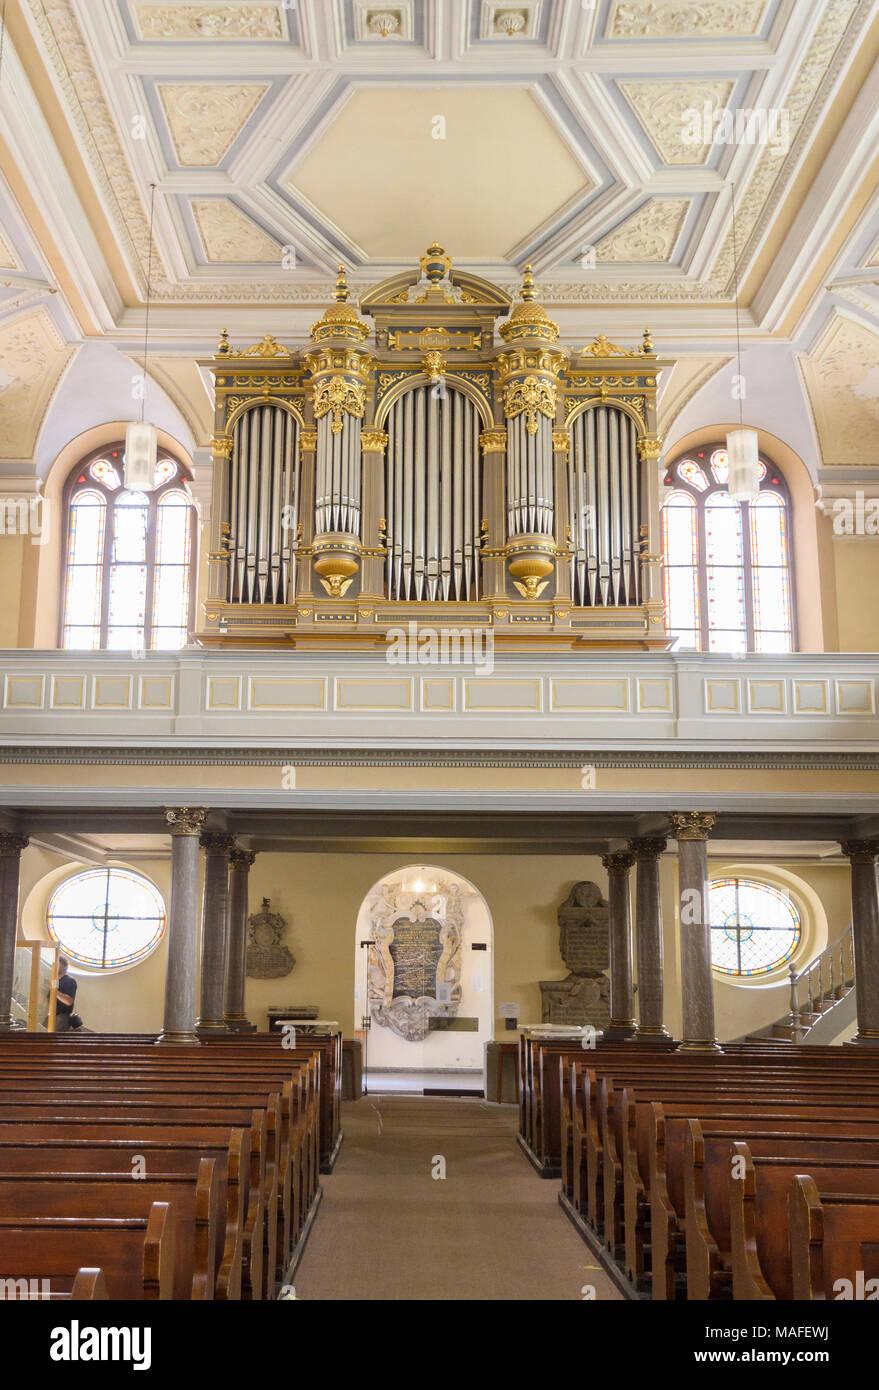 Providenzkirche, Heidelberg, Baden-Württemberg, Deutschland - Stock Image